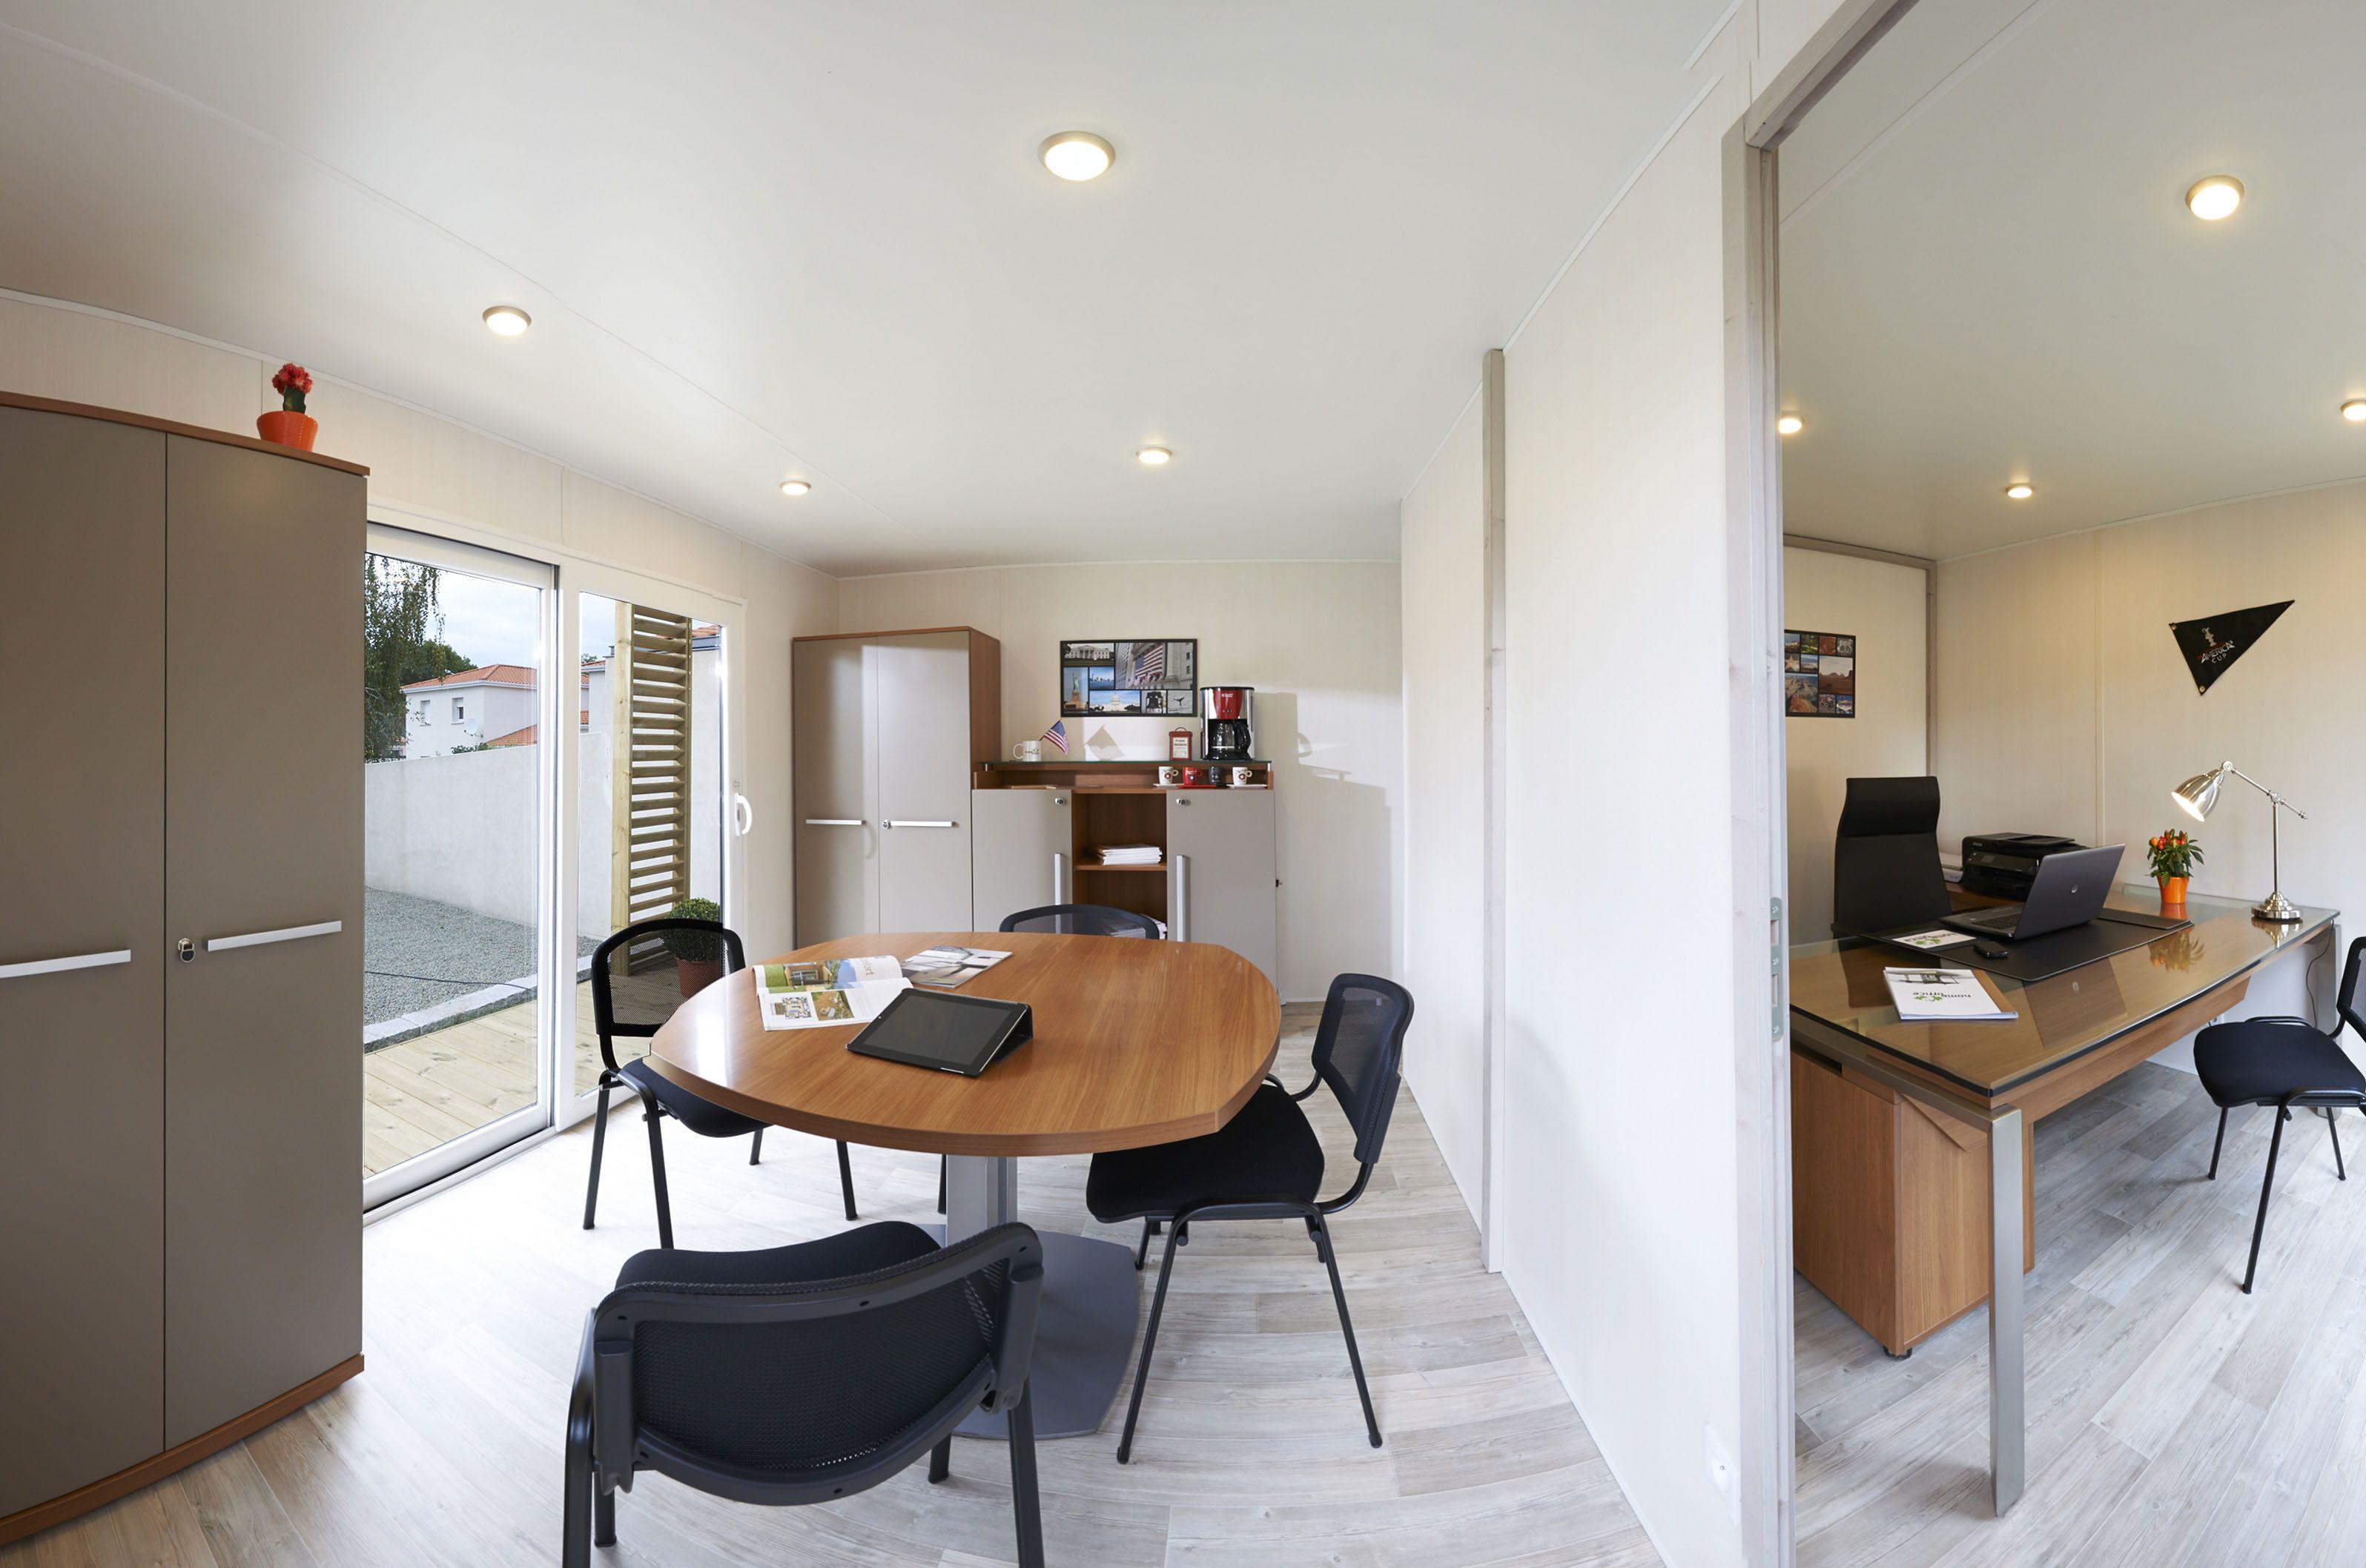 Home office modèle garden office wall street m vue générale